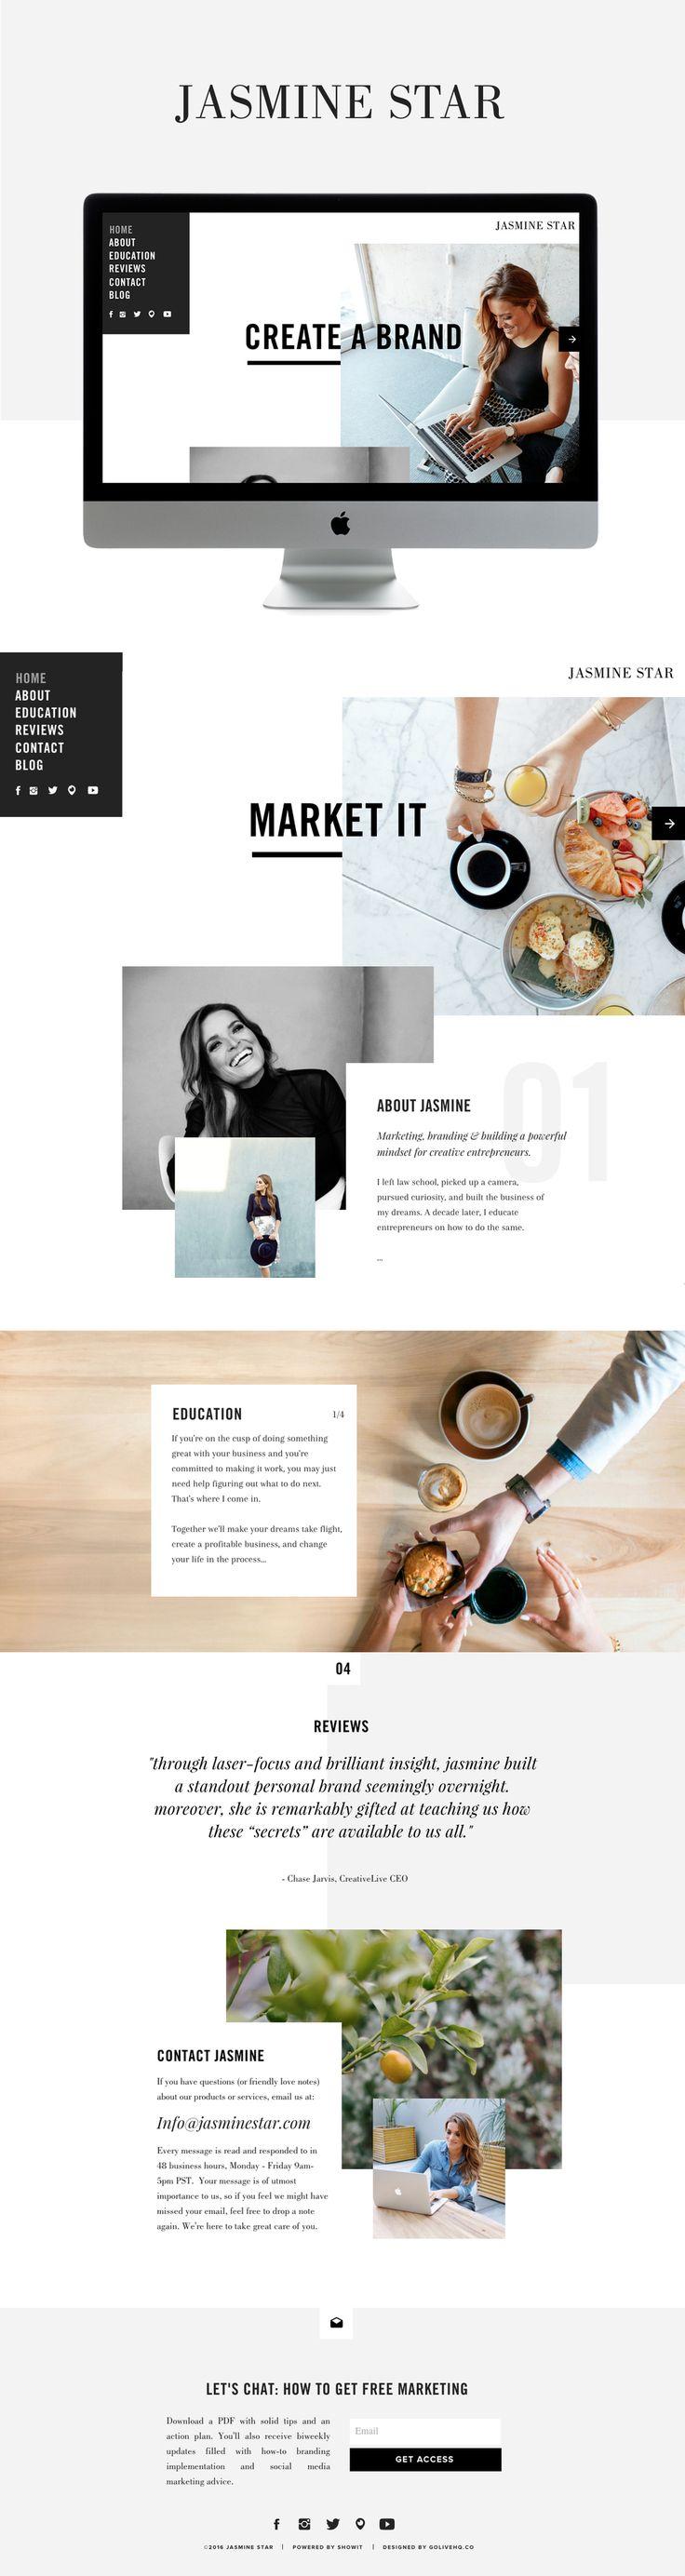 jasmine star website - inspiration | by golivehq.co